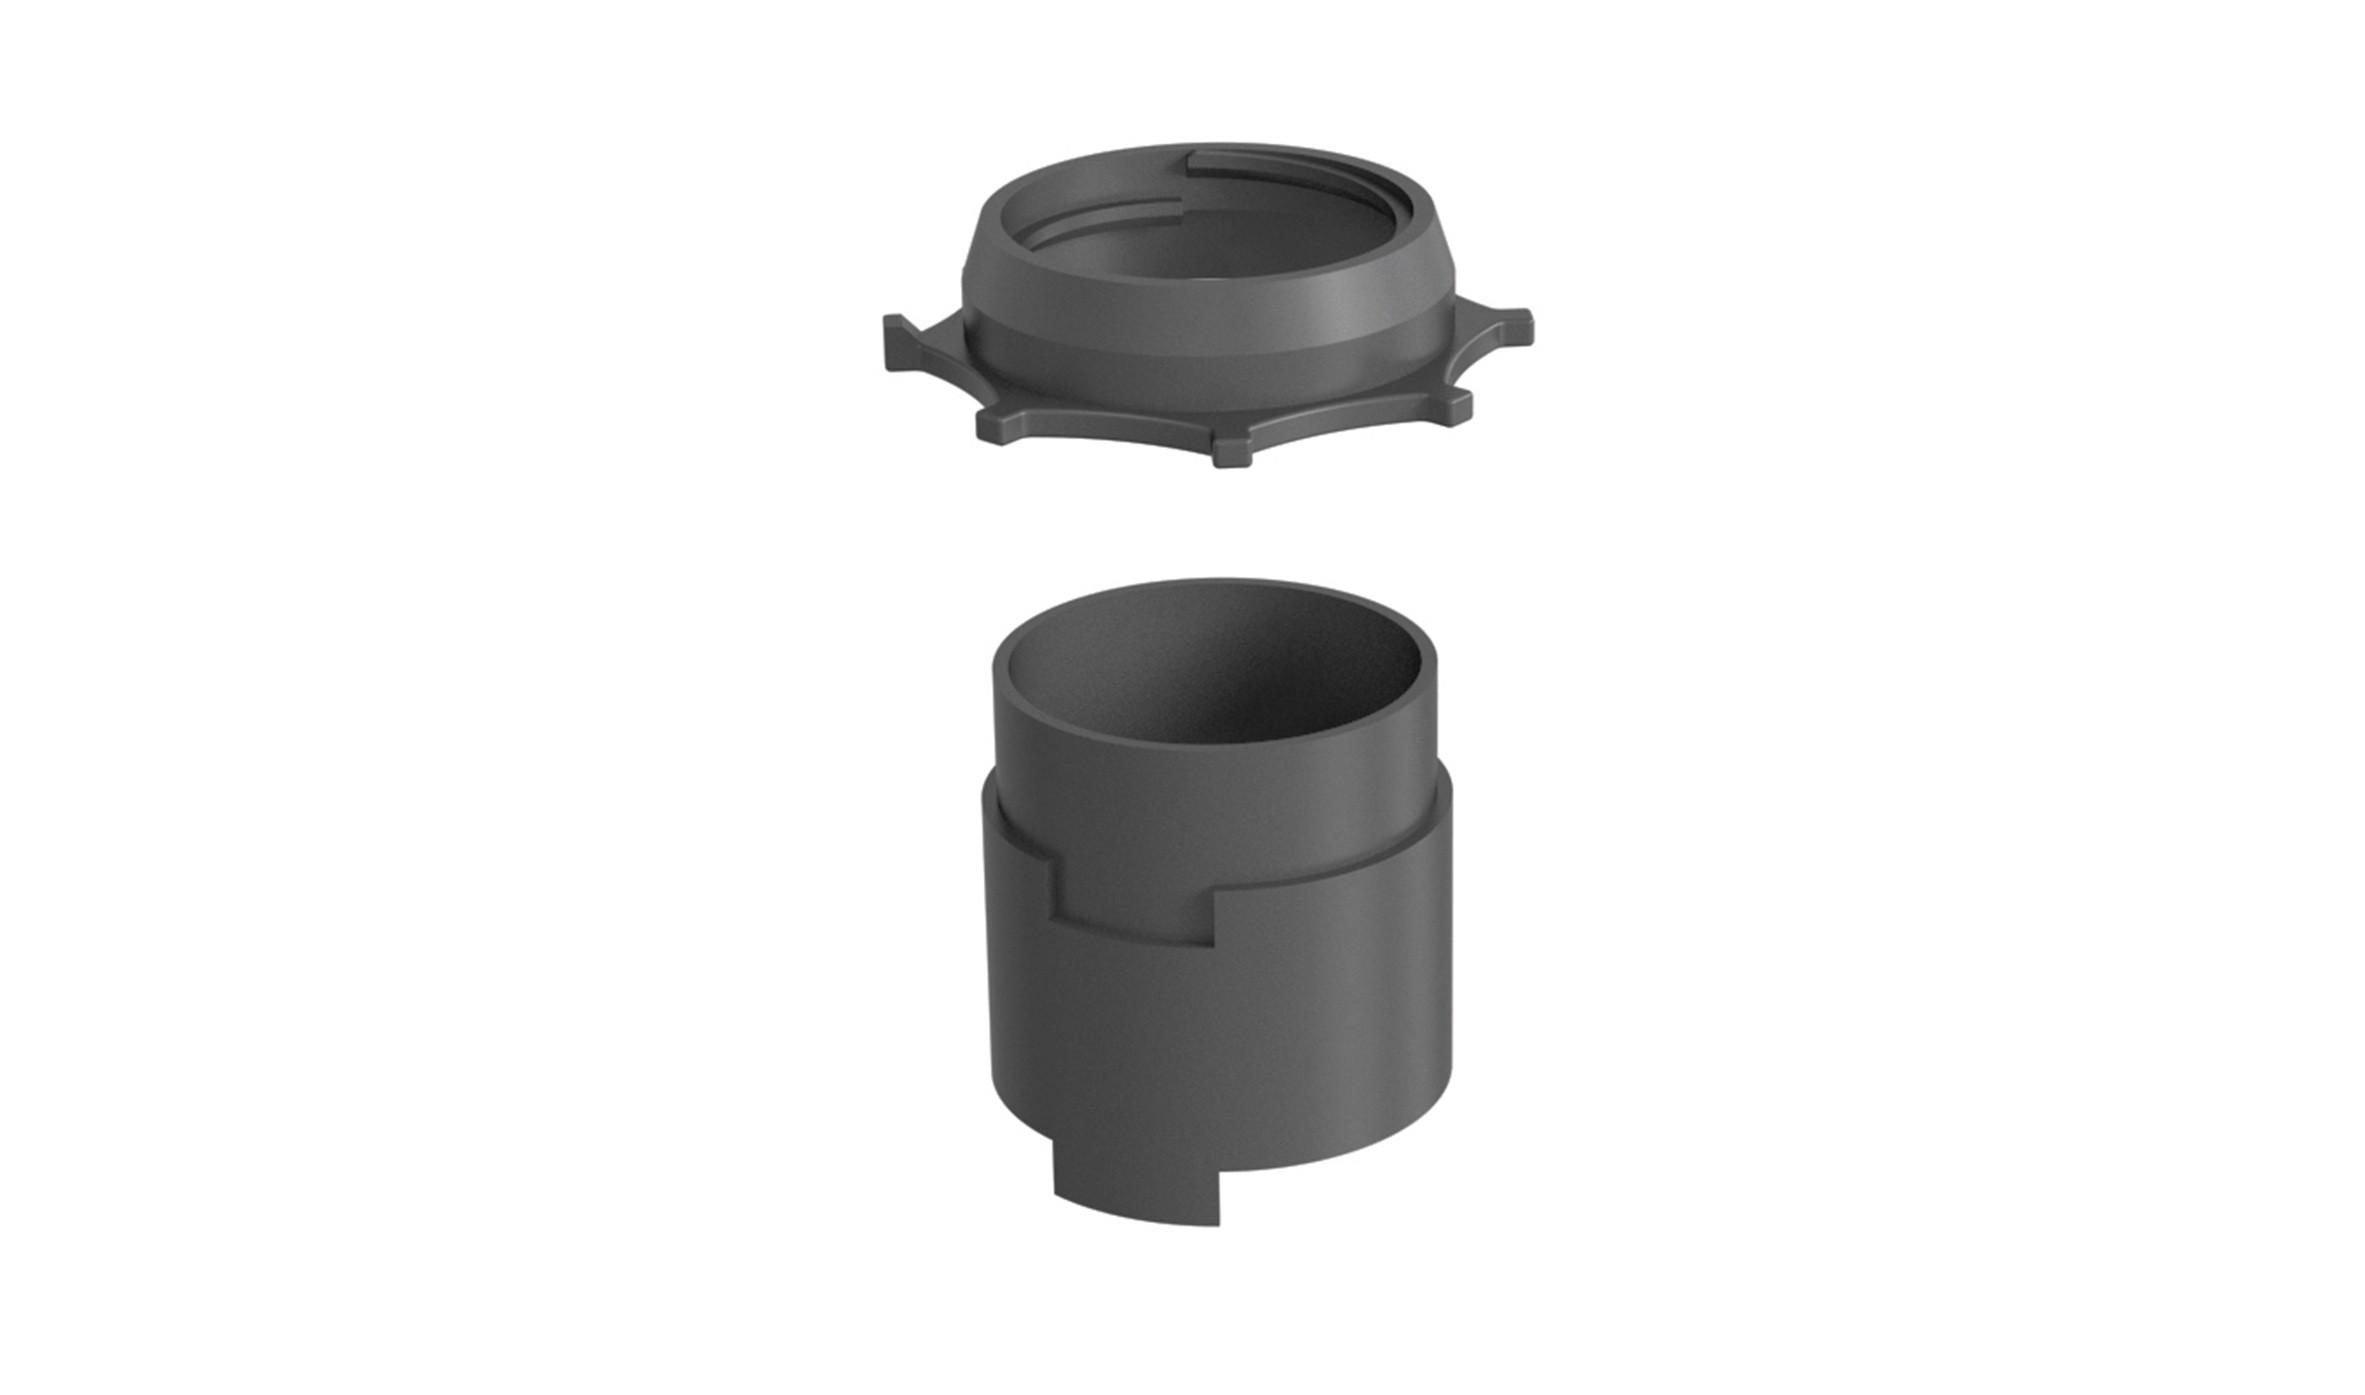 Install-Products-Photos Pedestals Thumbnail Accessories-PSB-thumbnail